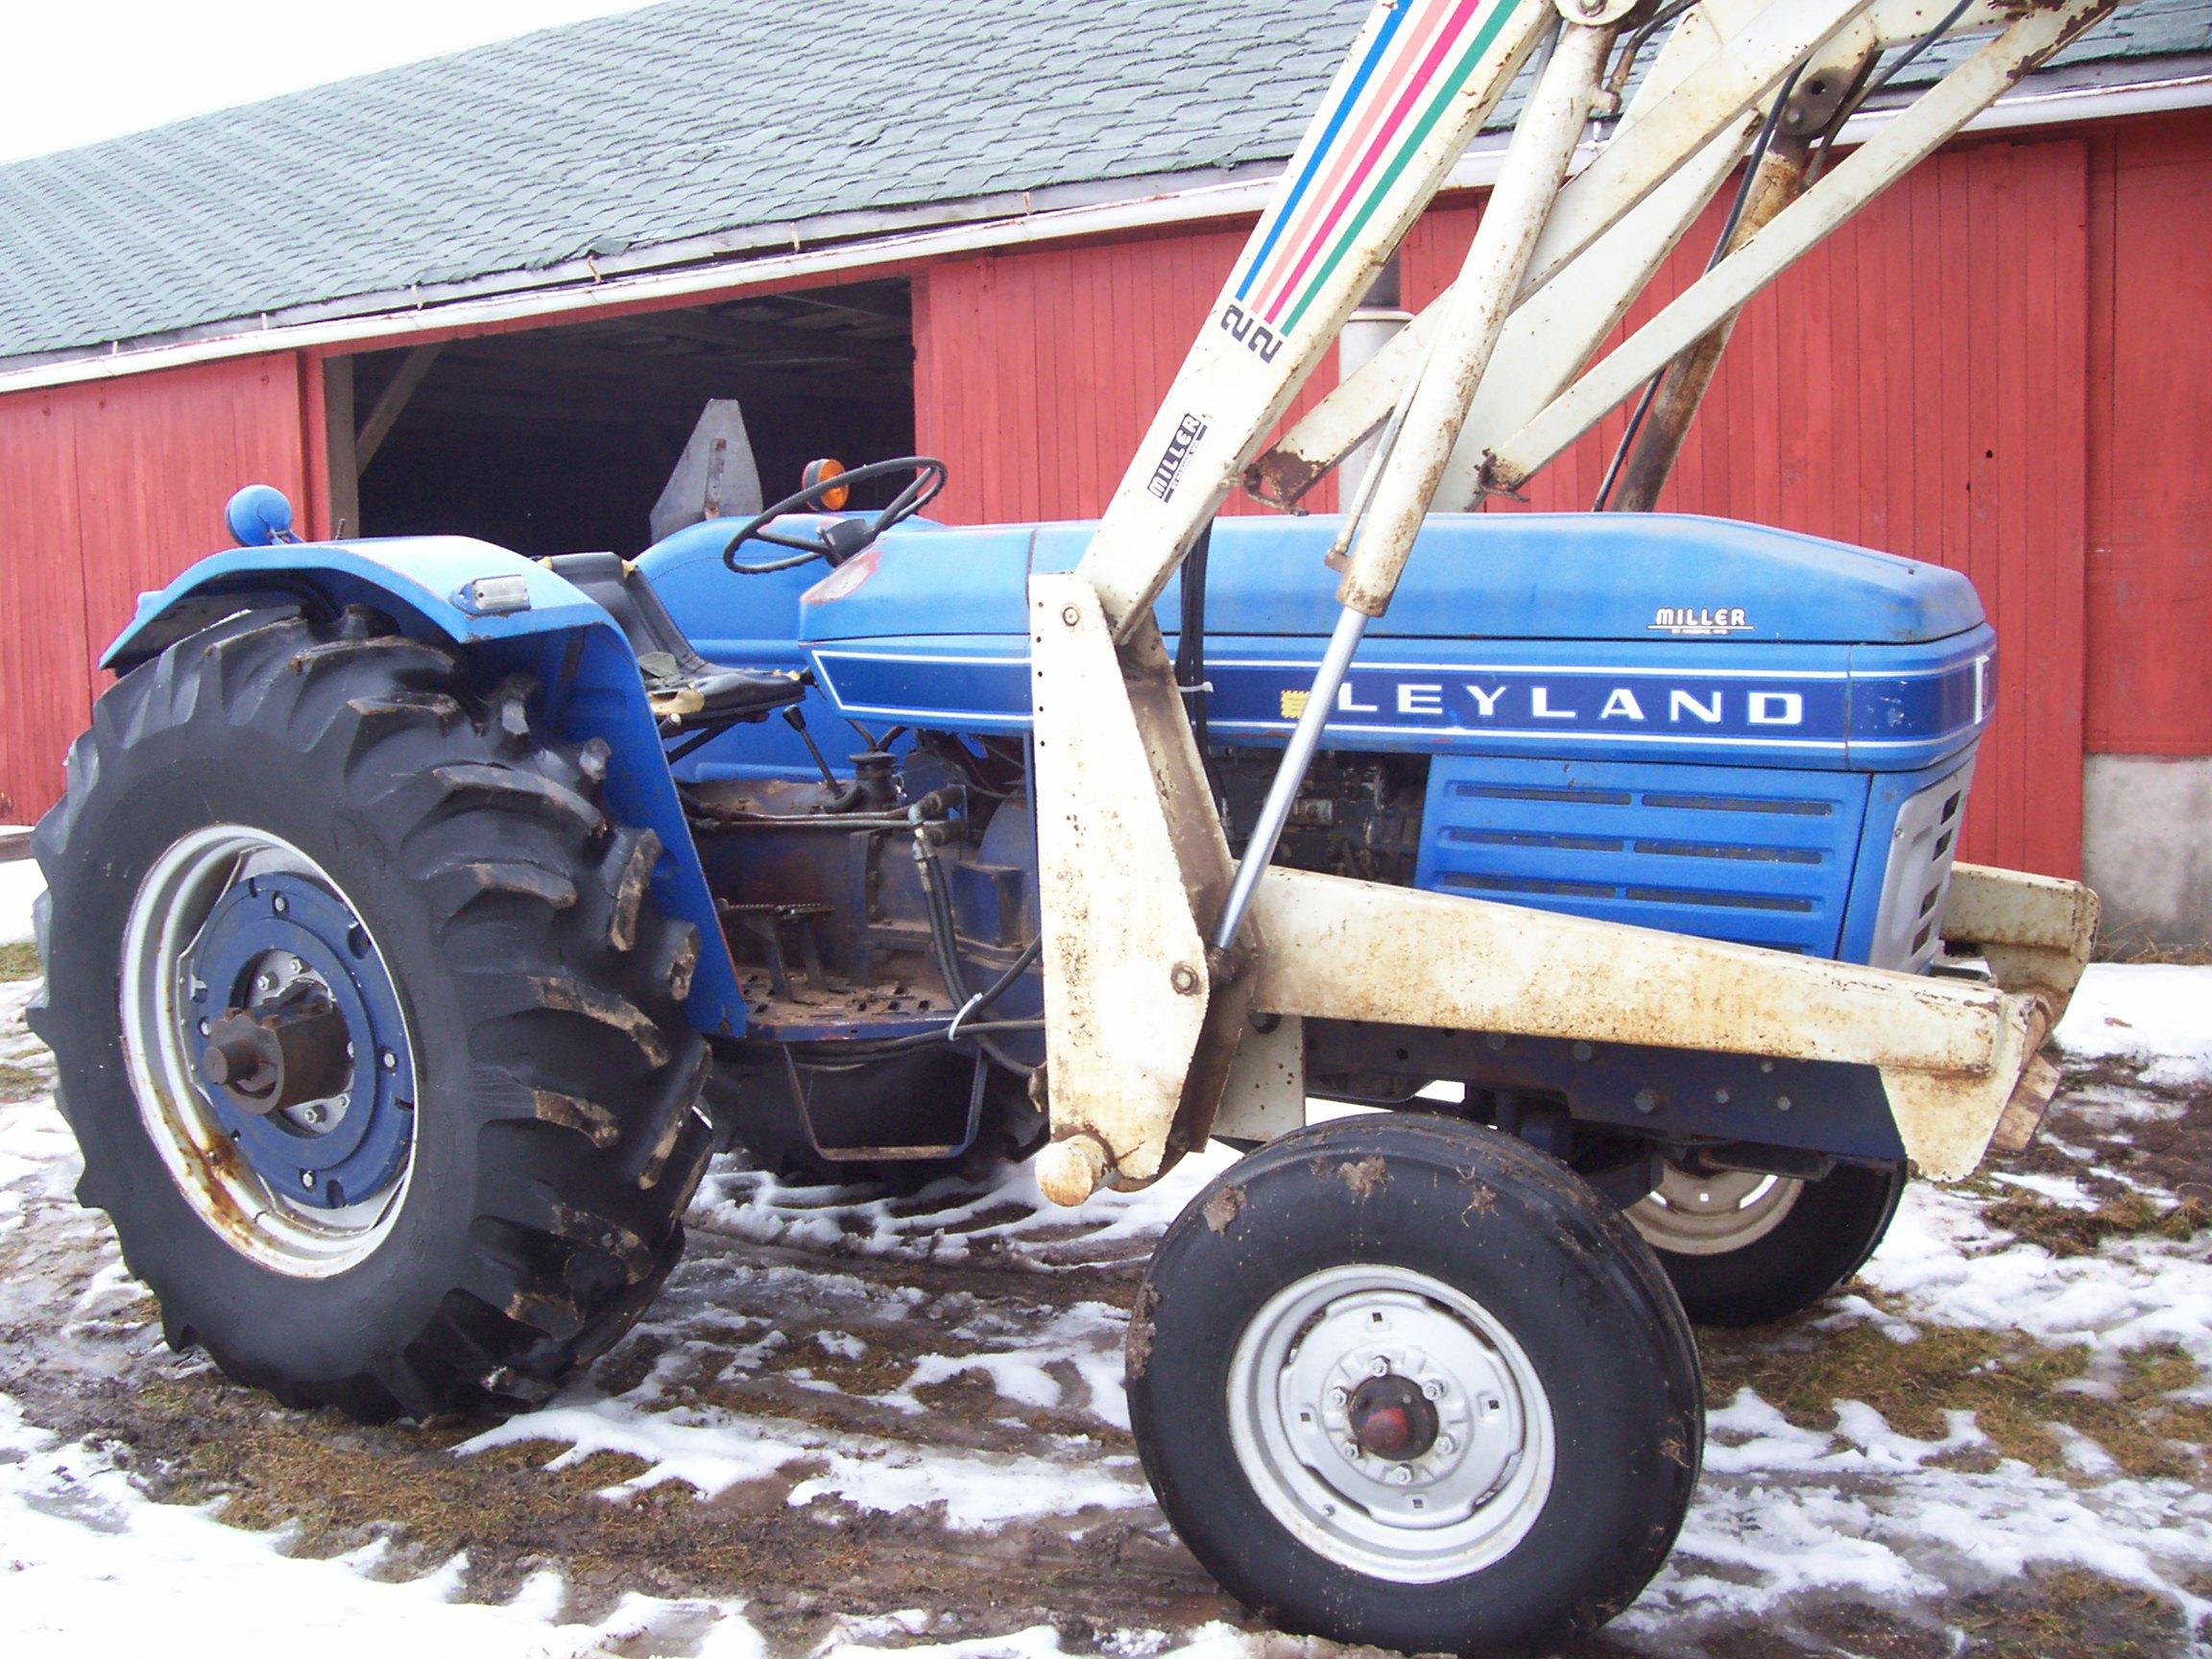 Leyland Tractor on Range Rover Engines Wiki